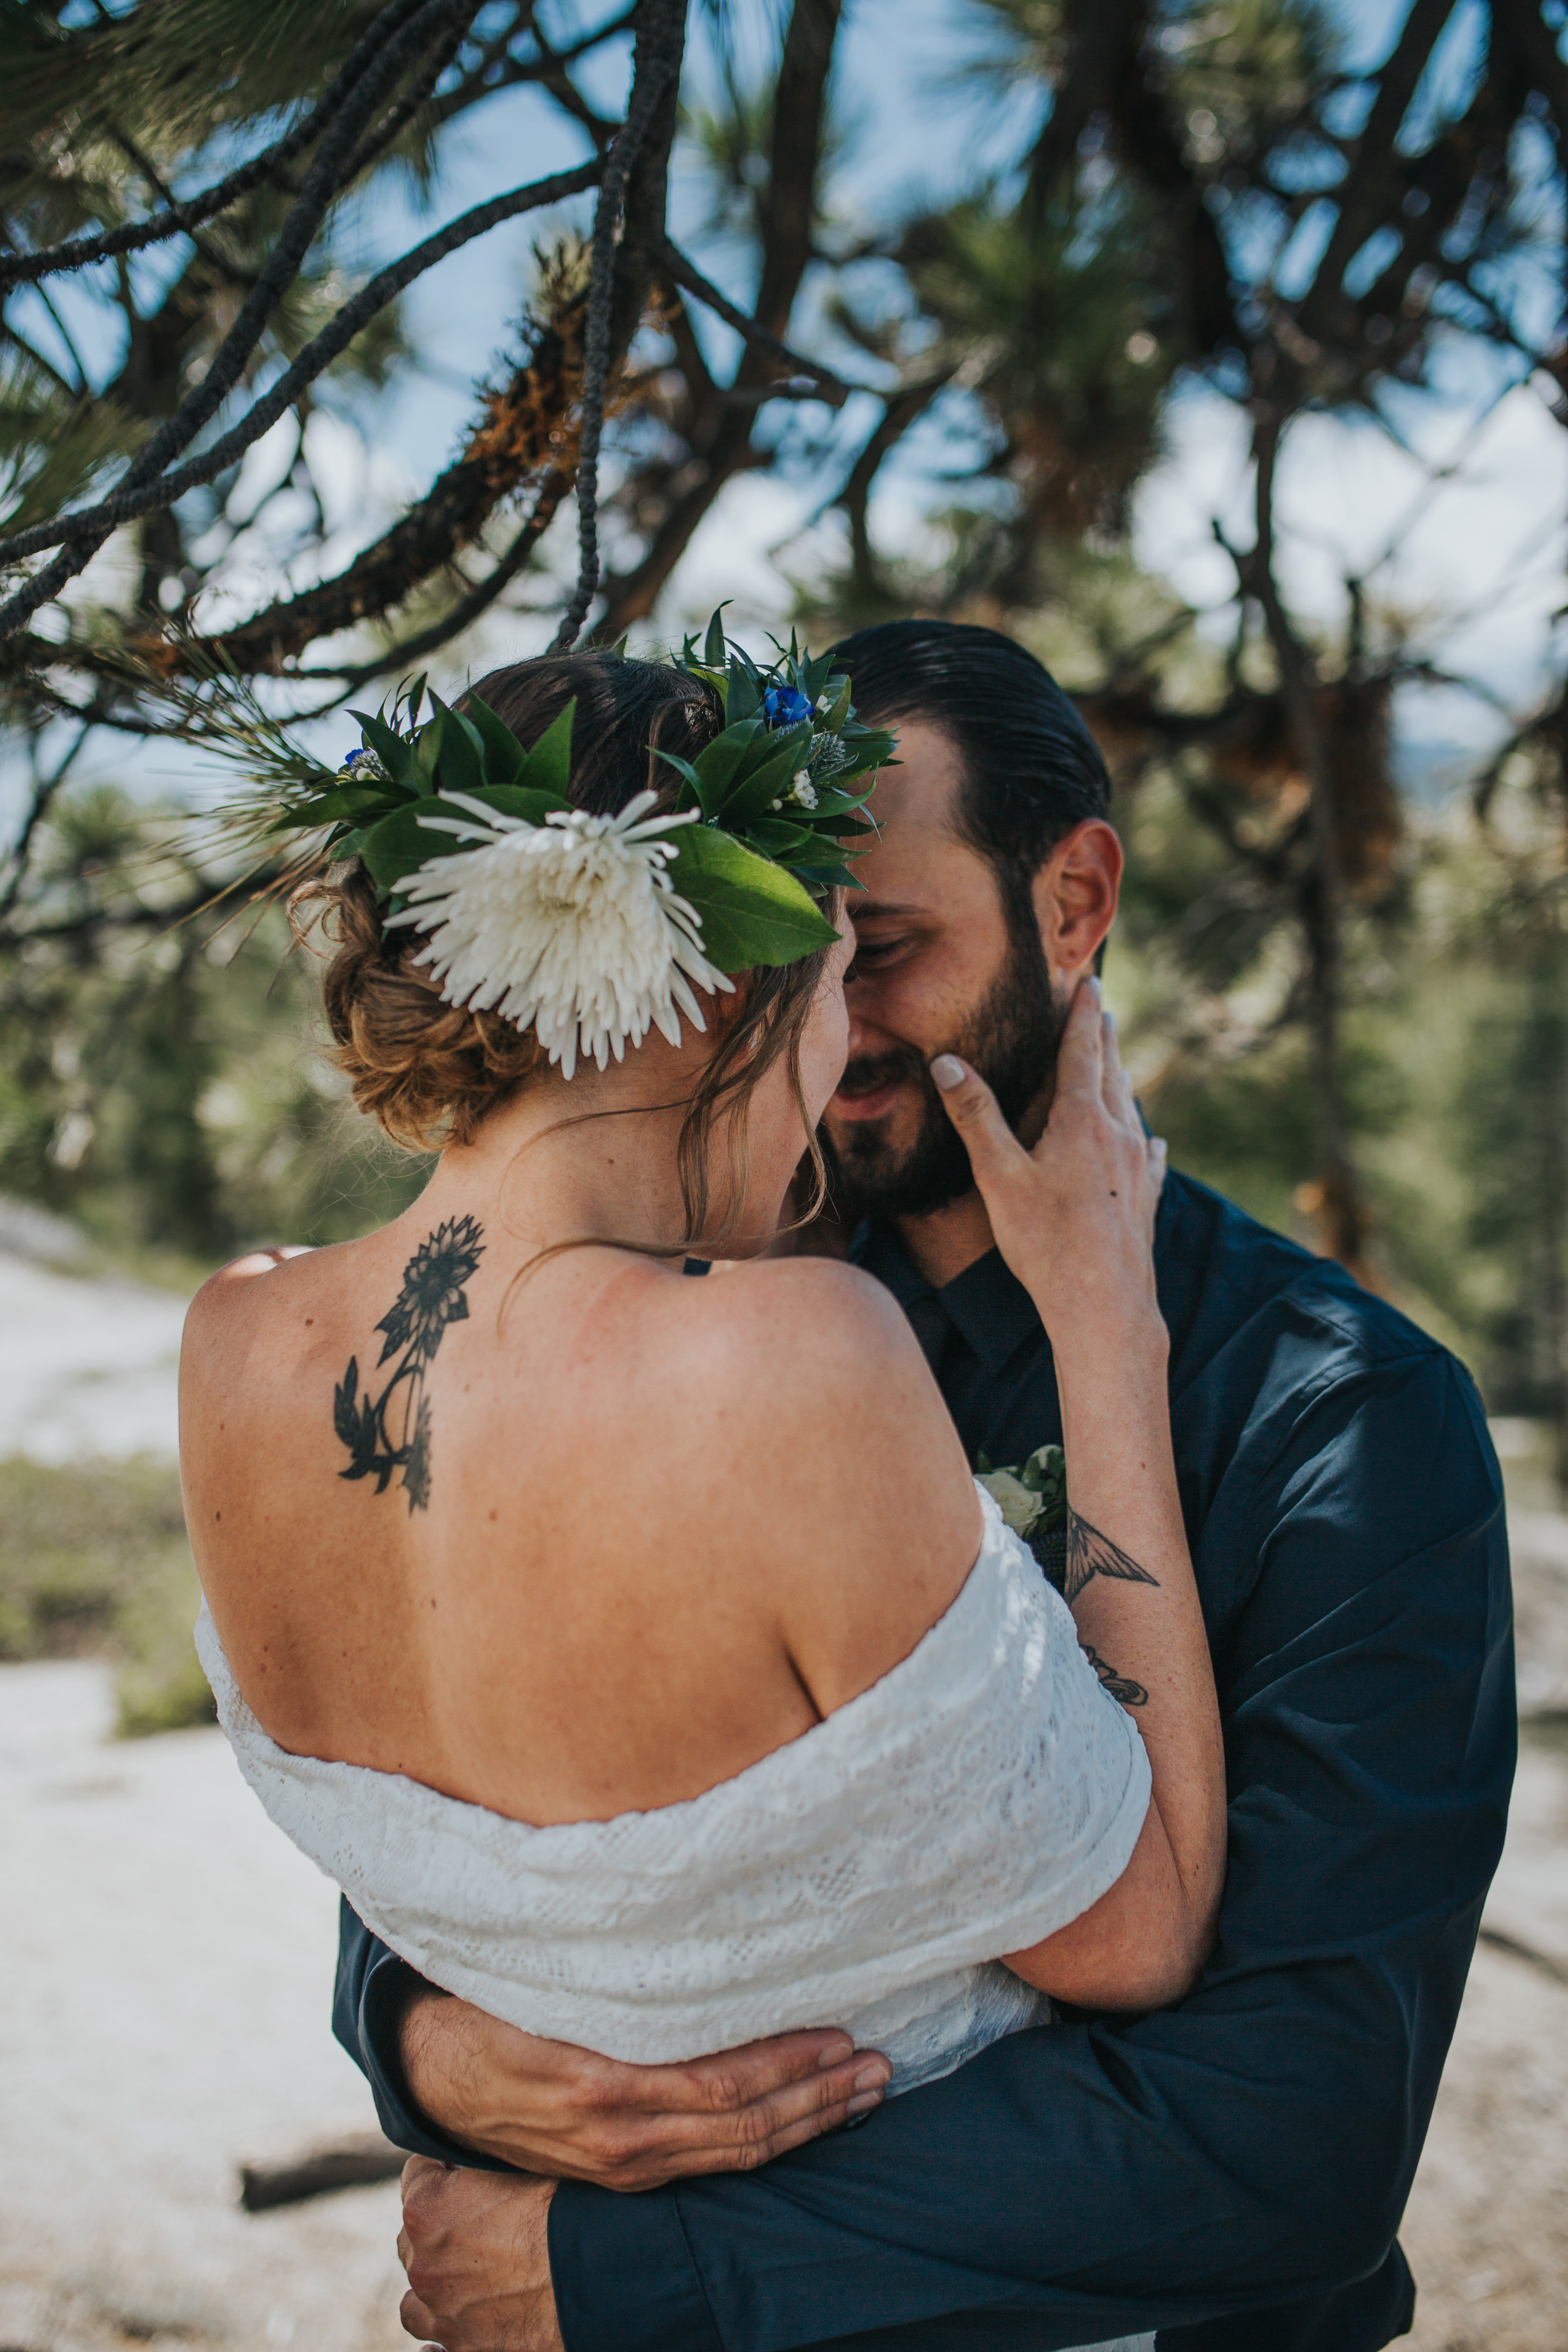 south-lake-tahoe-elopement-valerie-lendvay-photo-018.jpg